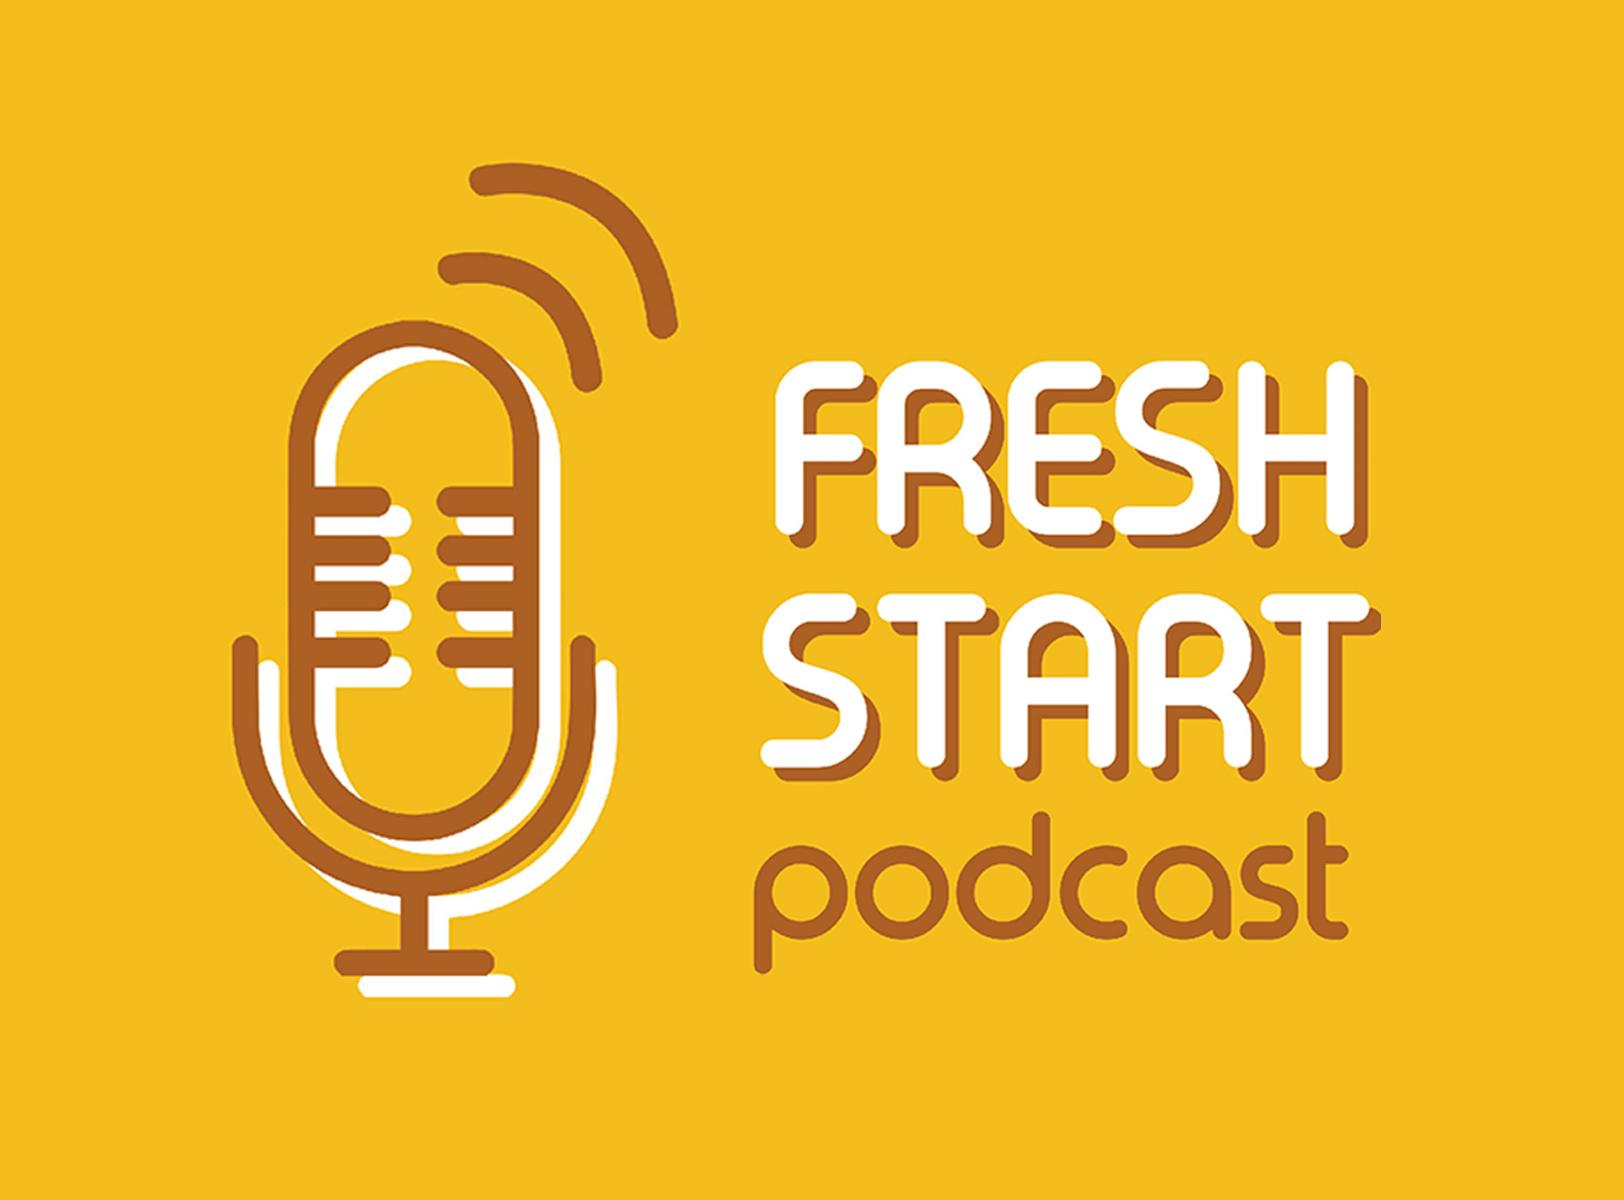 Fresh Start: Podcast News (1/10/2019 Thu.)